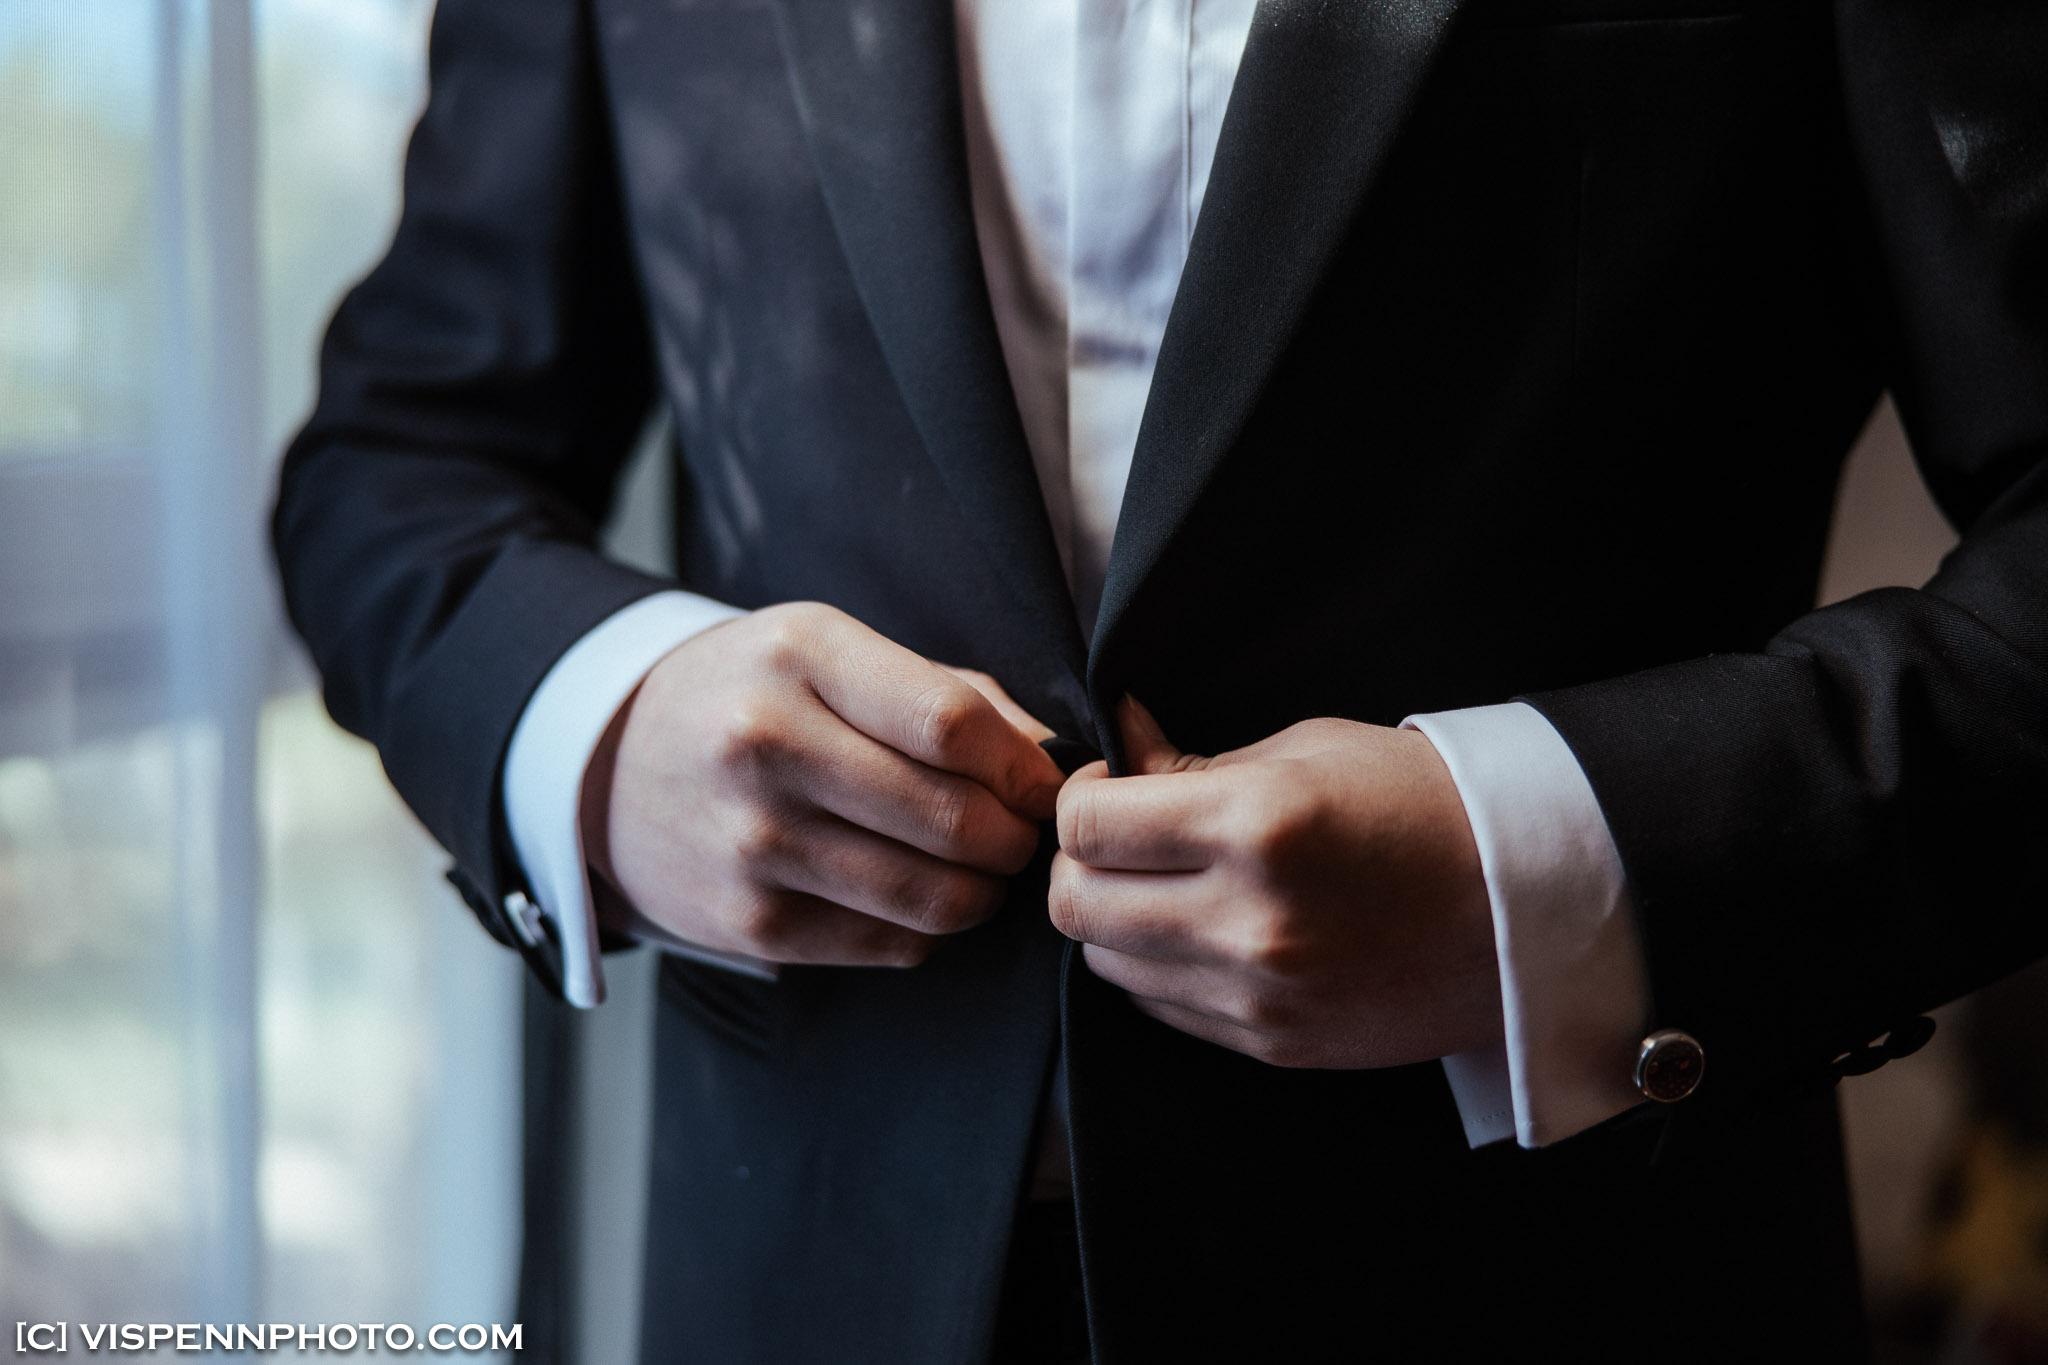 WEDDING DAY Photography Melbourne LeanneWesley 00116 1P EOSR ZHPENN